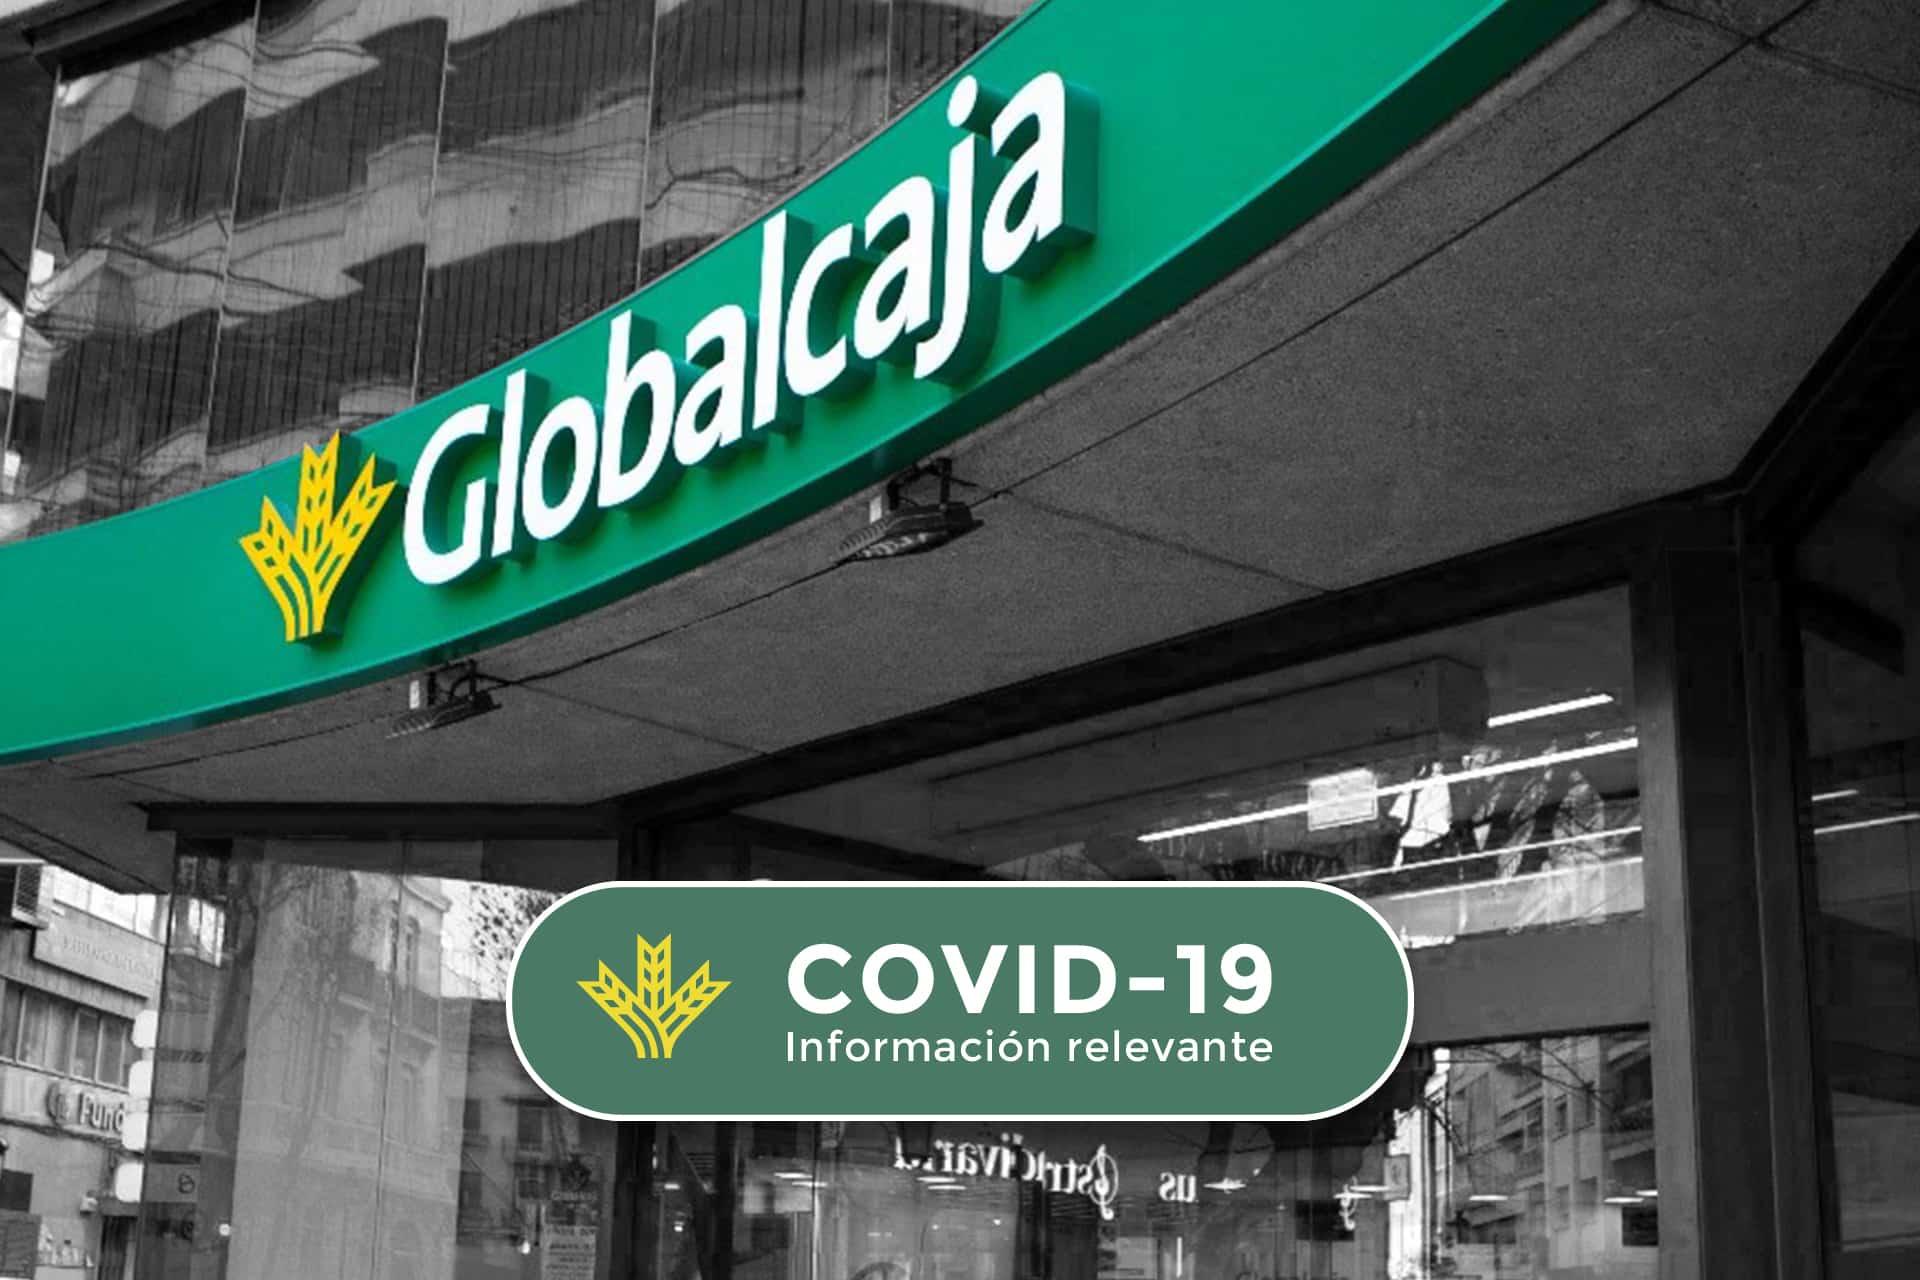 https://blog.globalcaja.es/wp-content/uploads/2020/03/covid-19-2.jpg